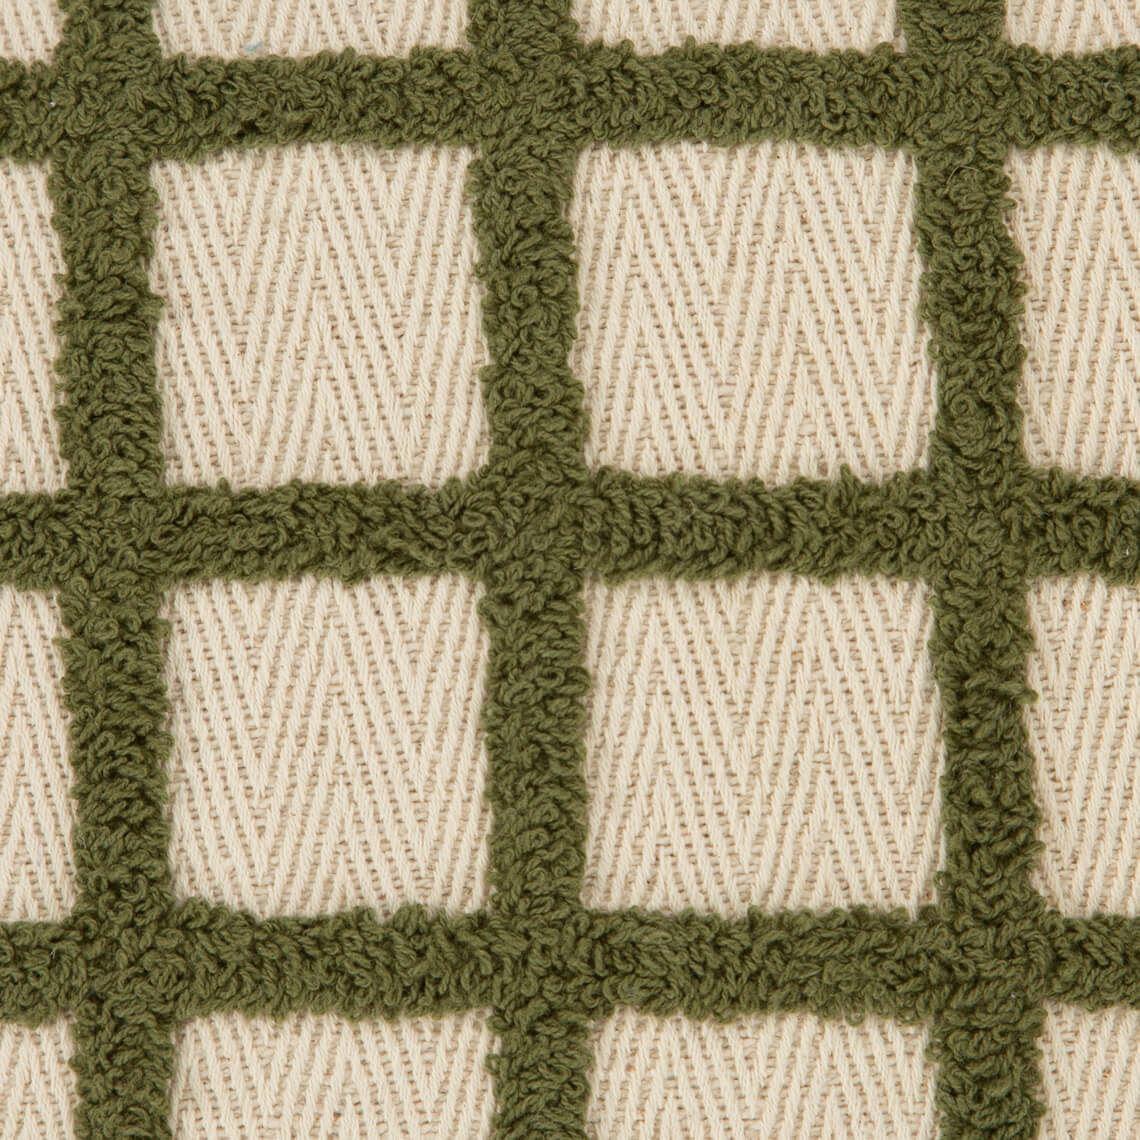 Janis Cushion Size W 50cm x D 50cm x H 10cm in Olive 100% Cotton Freedom